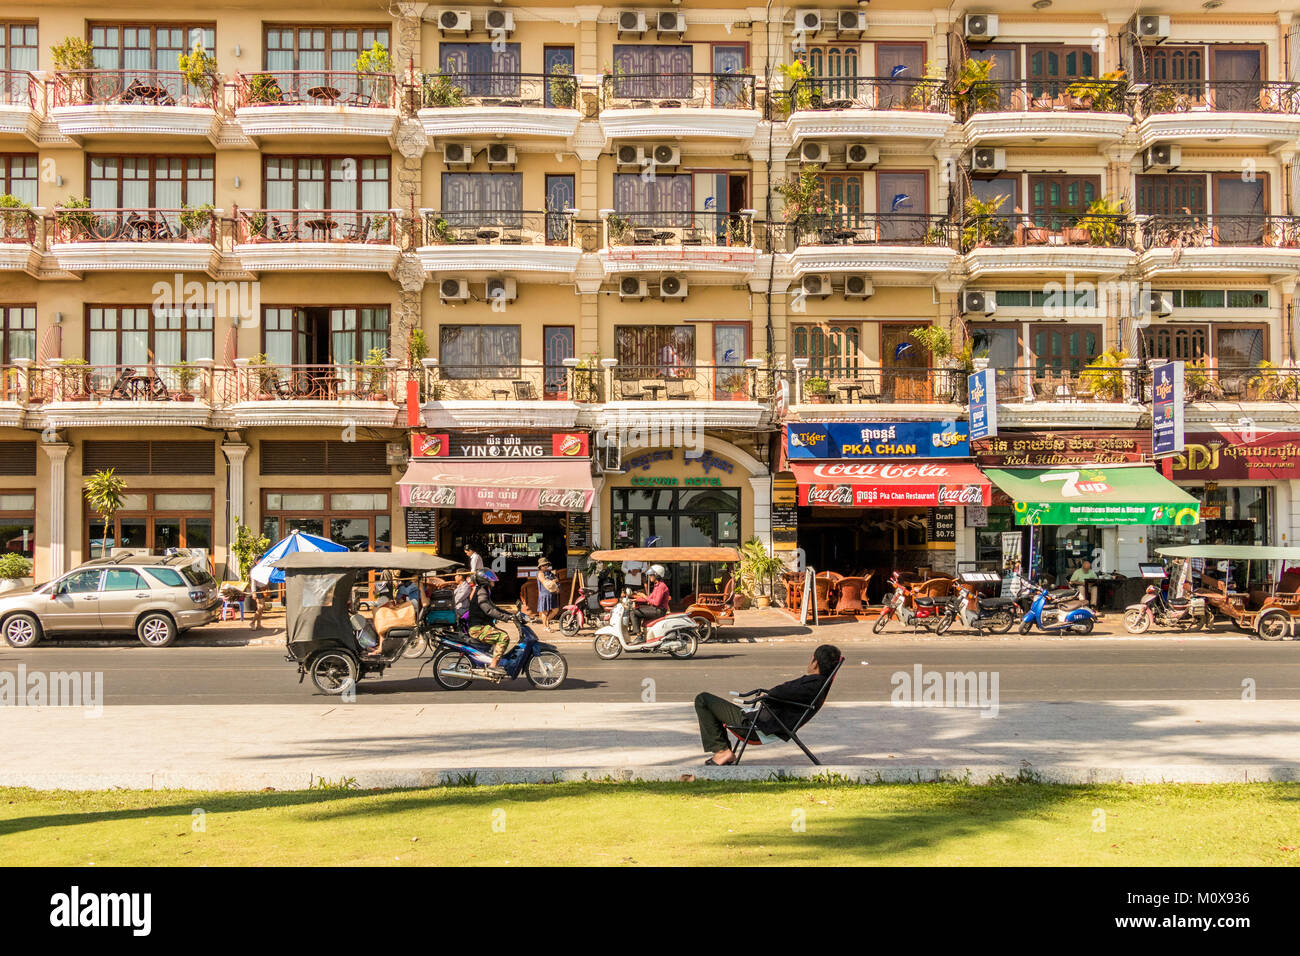 Preah Sisowath street Riverside Phnom Penh Cambodia Stock Photo